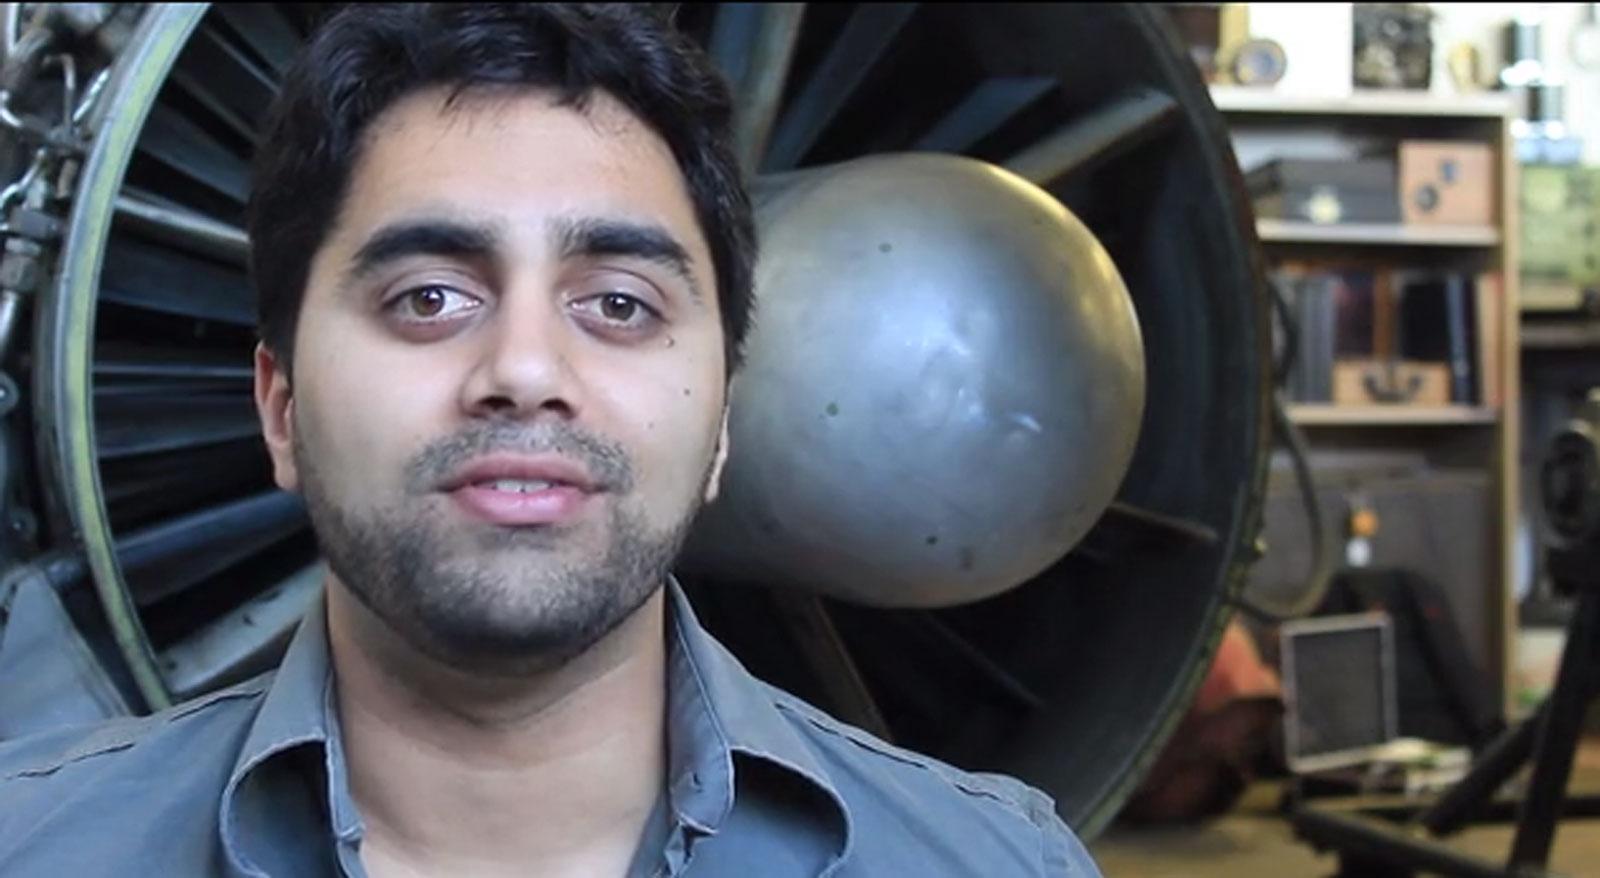 Photo from Kunal Dovedy's Kickstarter video. http://www.kunaldovedy.com/